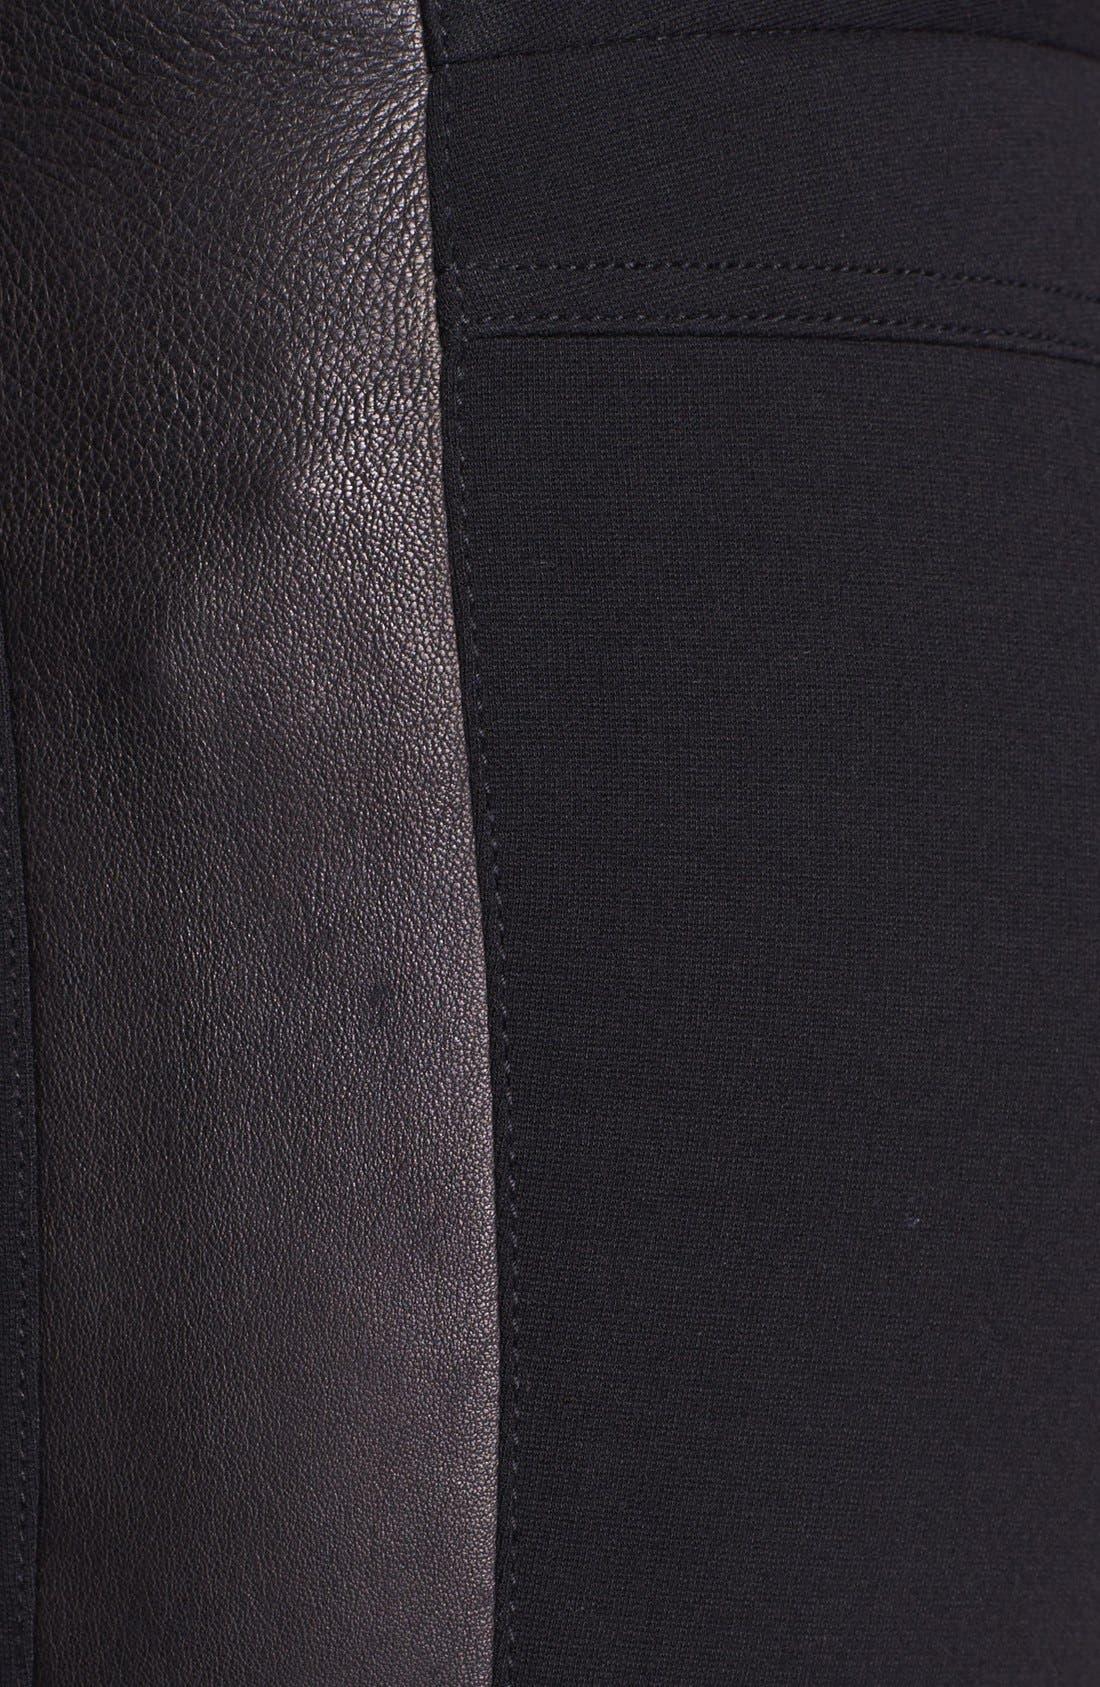 Alternate Image 3  - Diane von Furstenberg 'Leah' Leather & Pont Pants